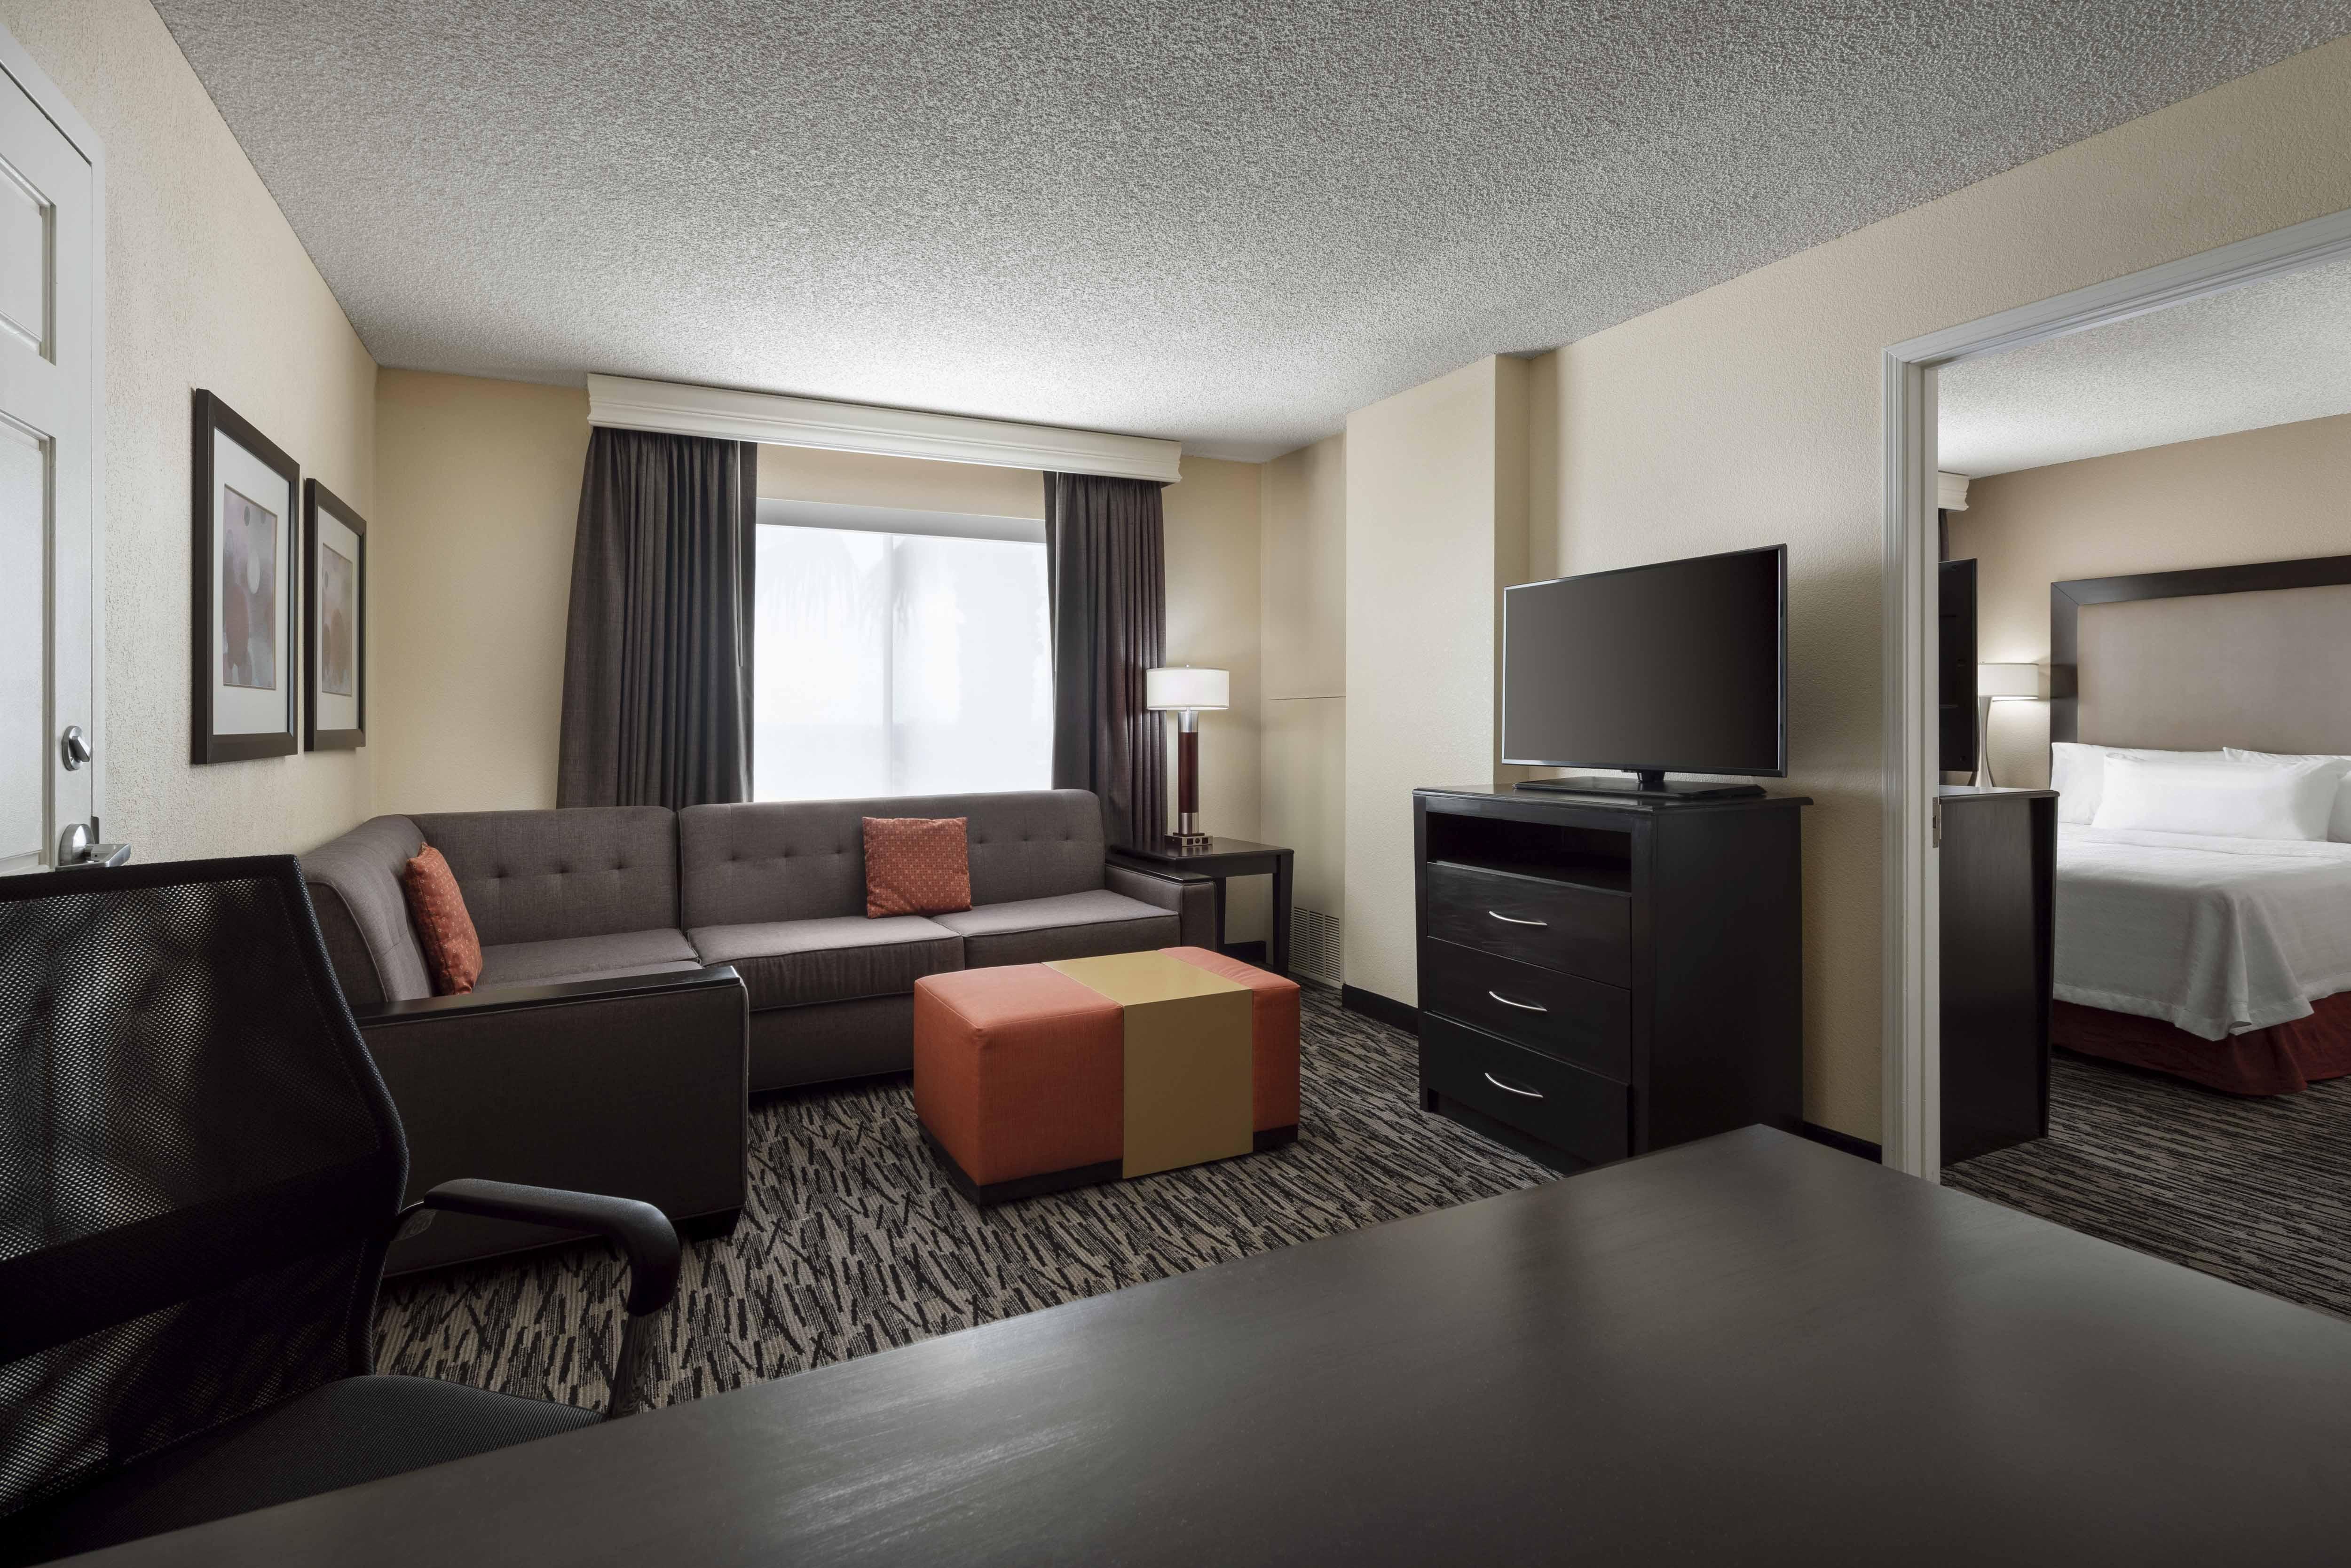 Homewood Suites by Hilton ™ Anaheim - Main Gate Area